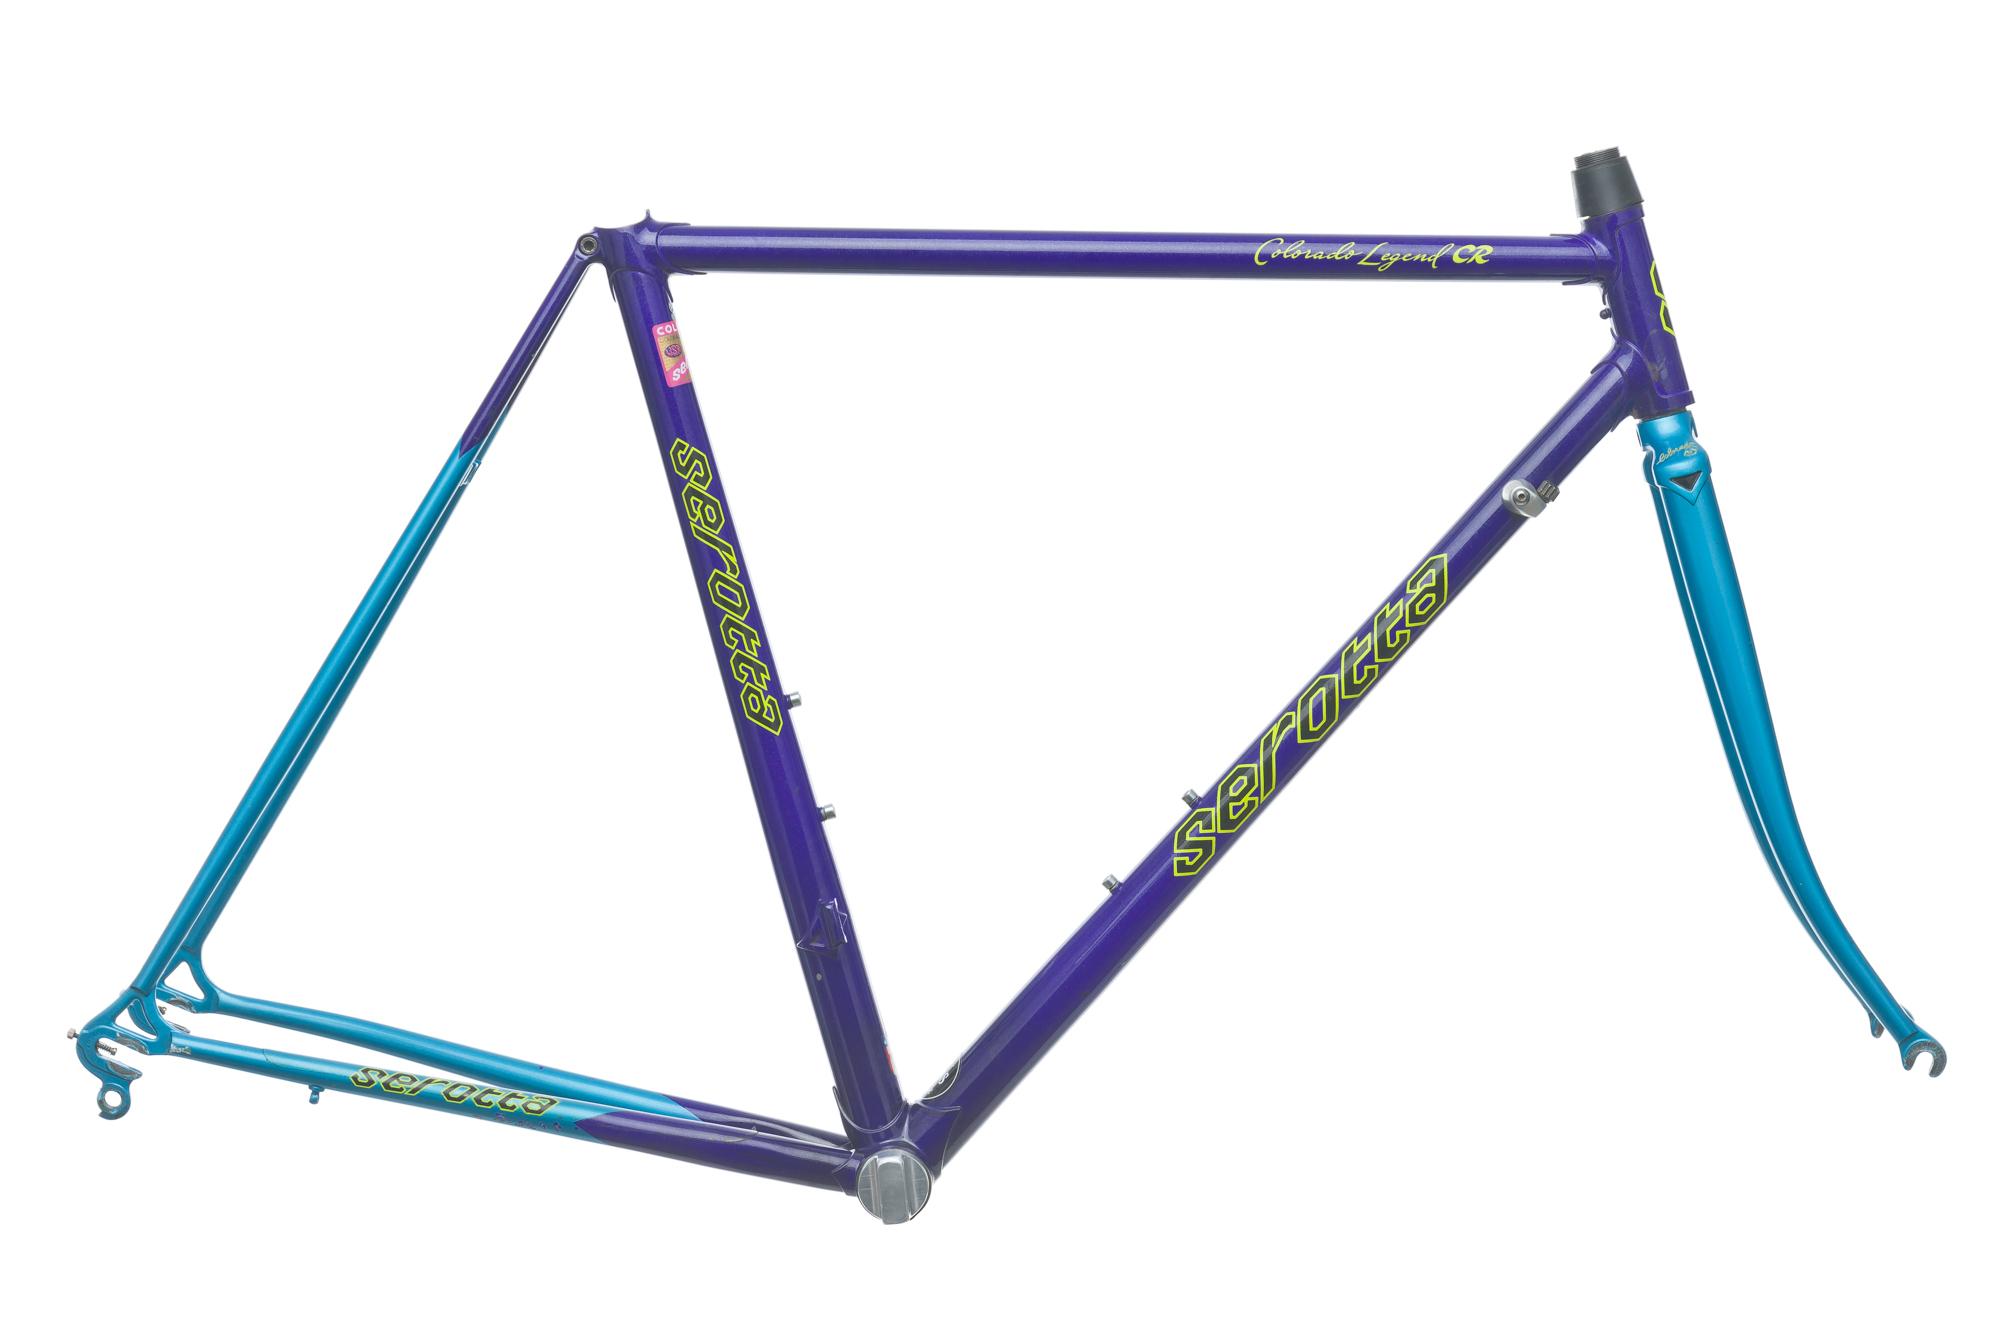 Vintage Serotta Colorado Legend CR Road Bike Frame Set 52cm Medium ...